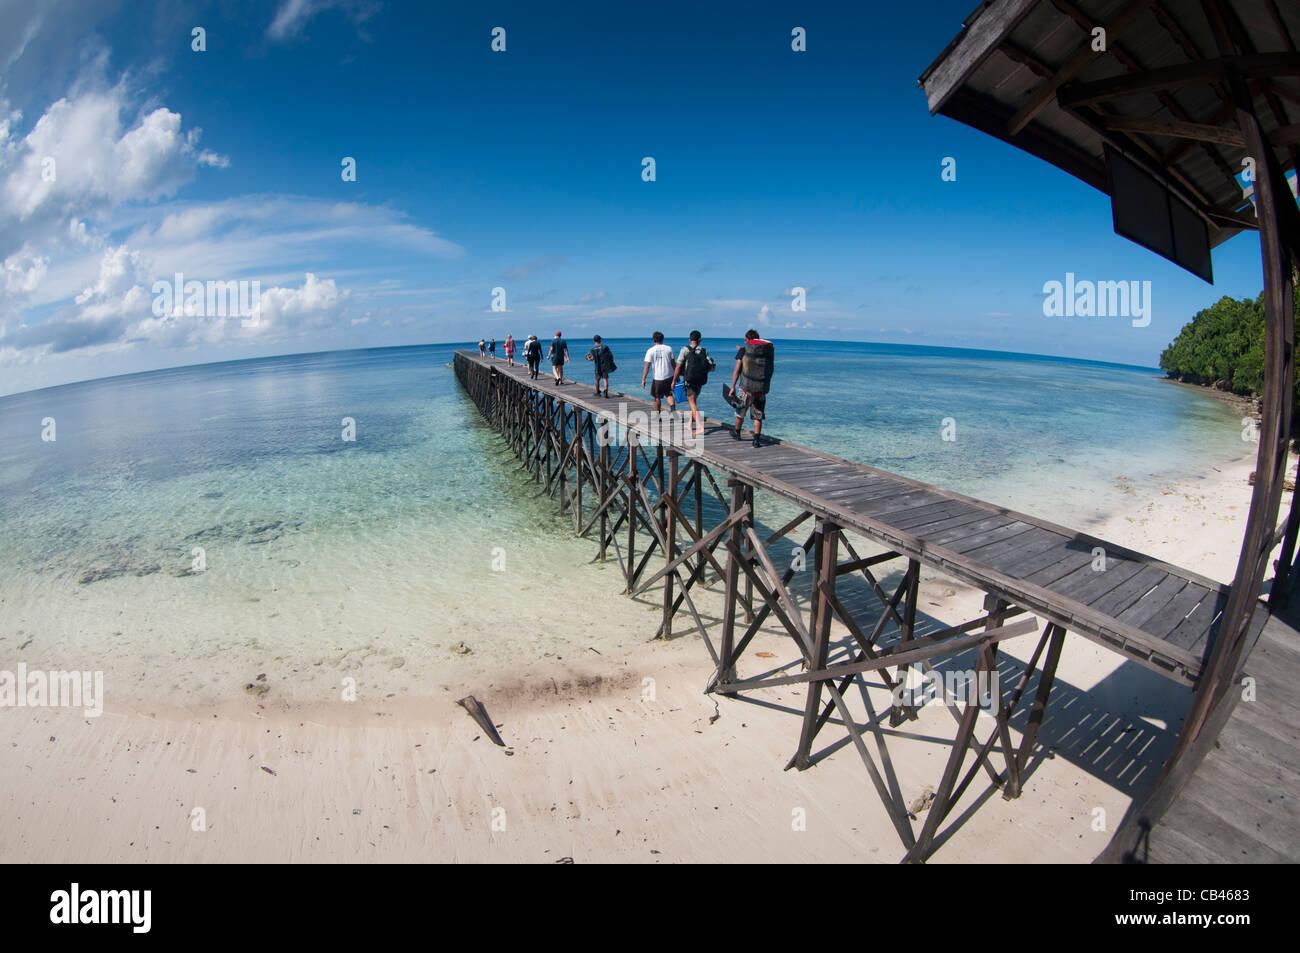 The welcoming pier at Jellyfish Lake, Jellyfish Lake, Kakaban Island, Berau, Kalimantan, Borneo, Indonesia, Pacific - Stock Image